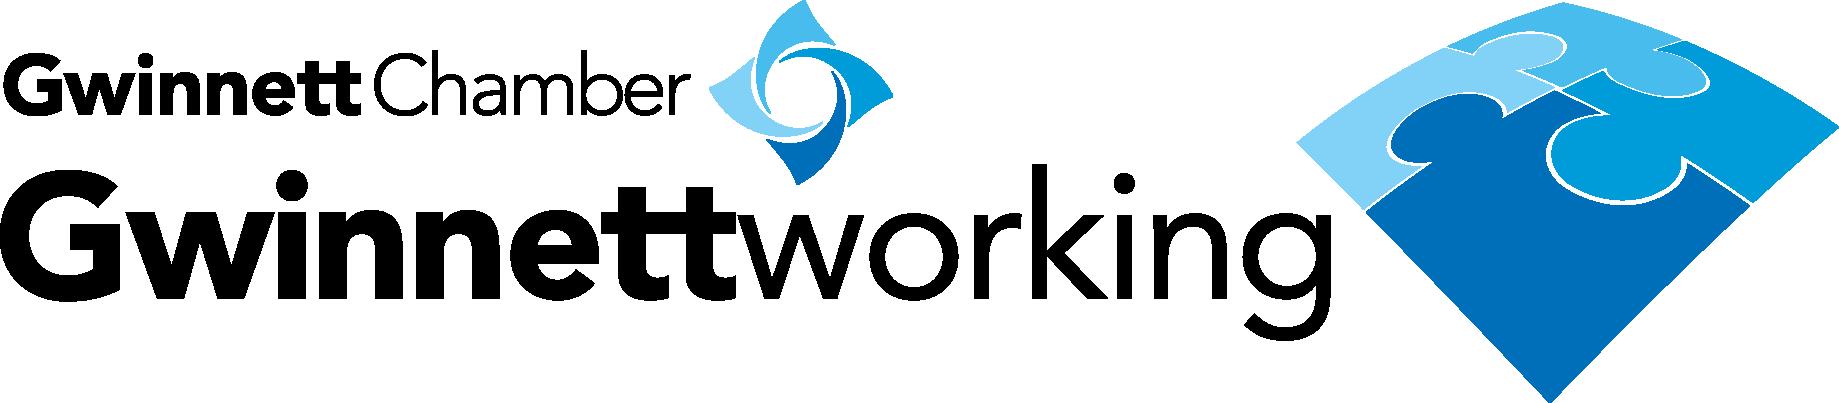 Gwinnettworking Logo_5744398.png